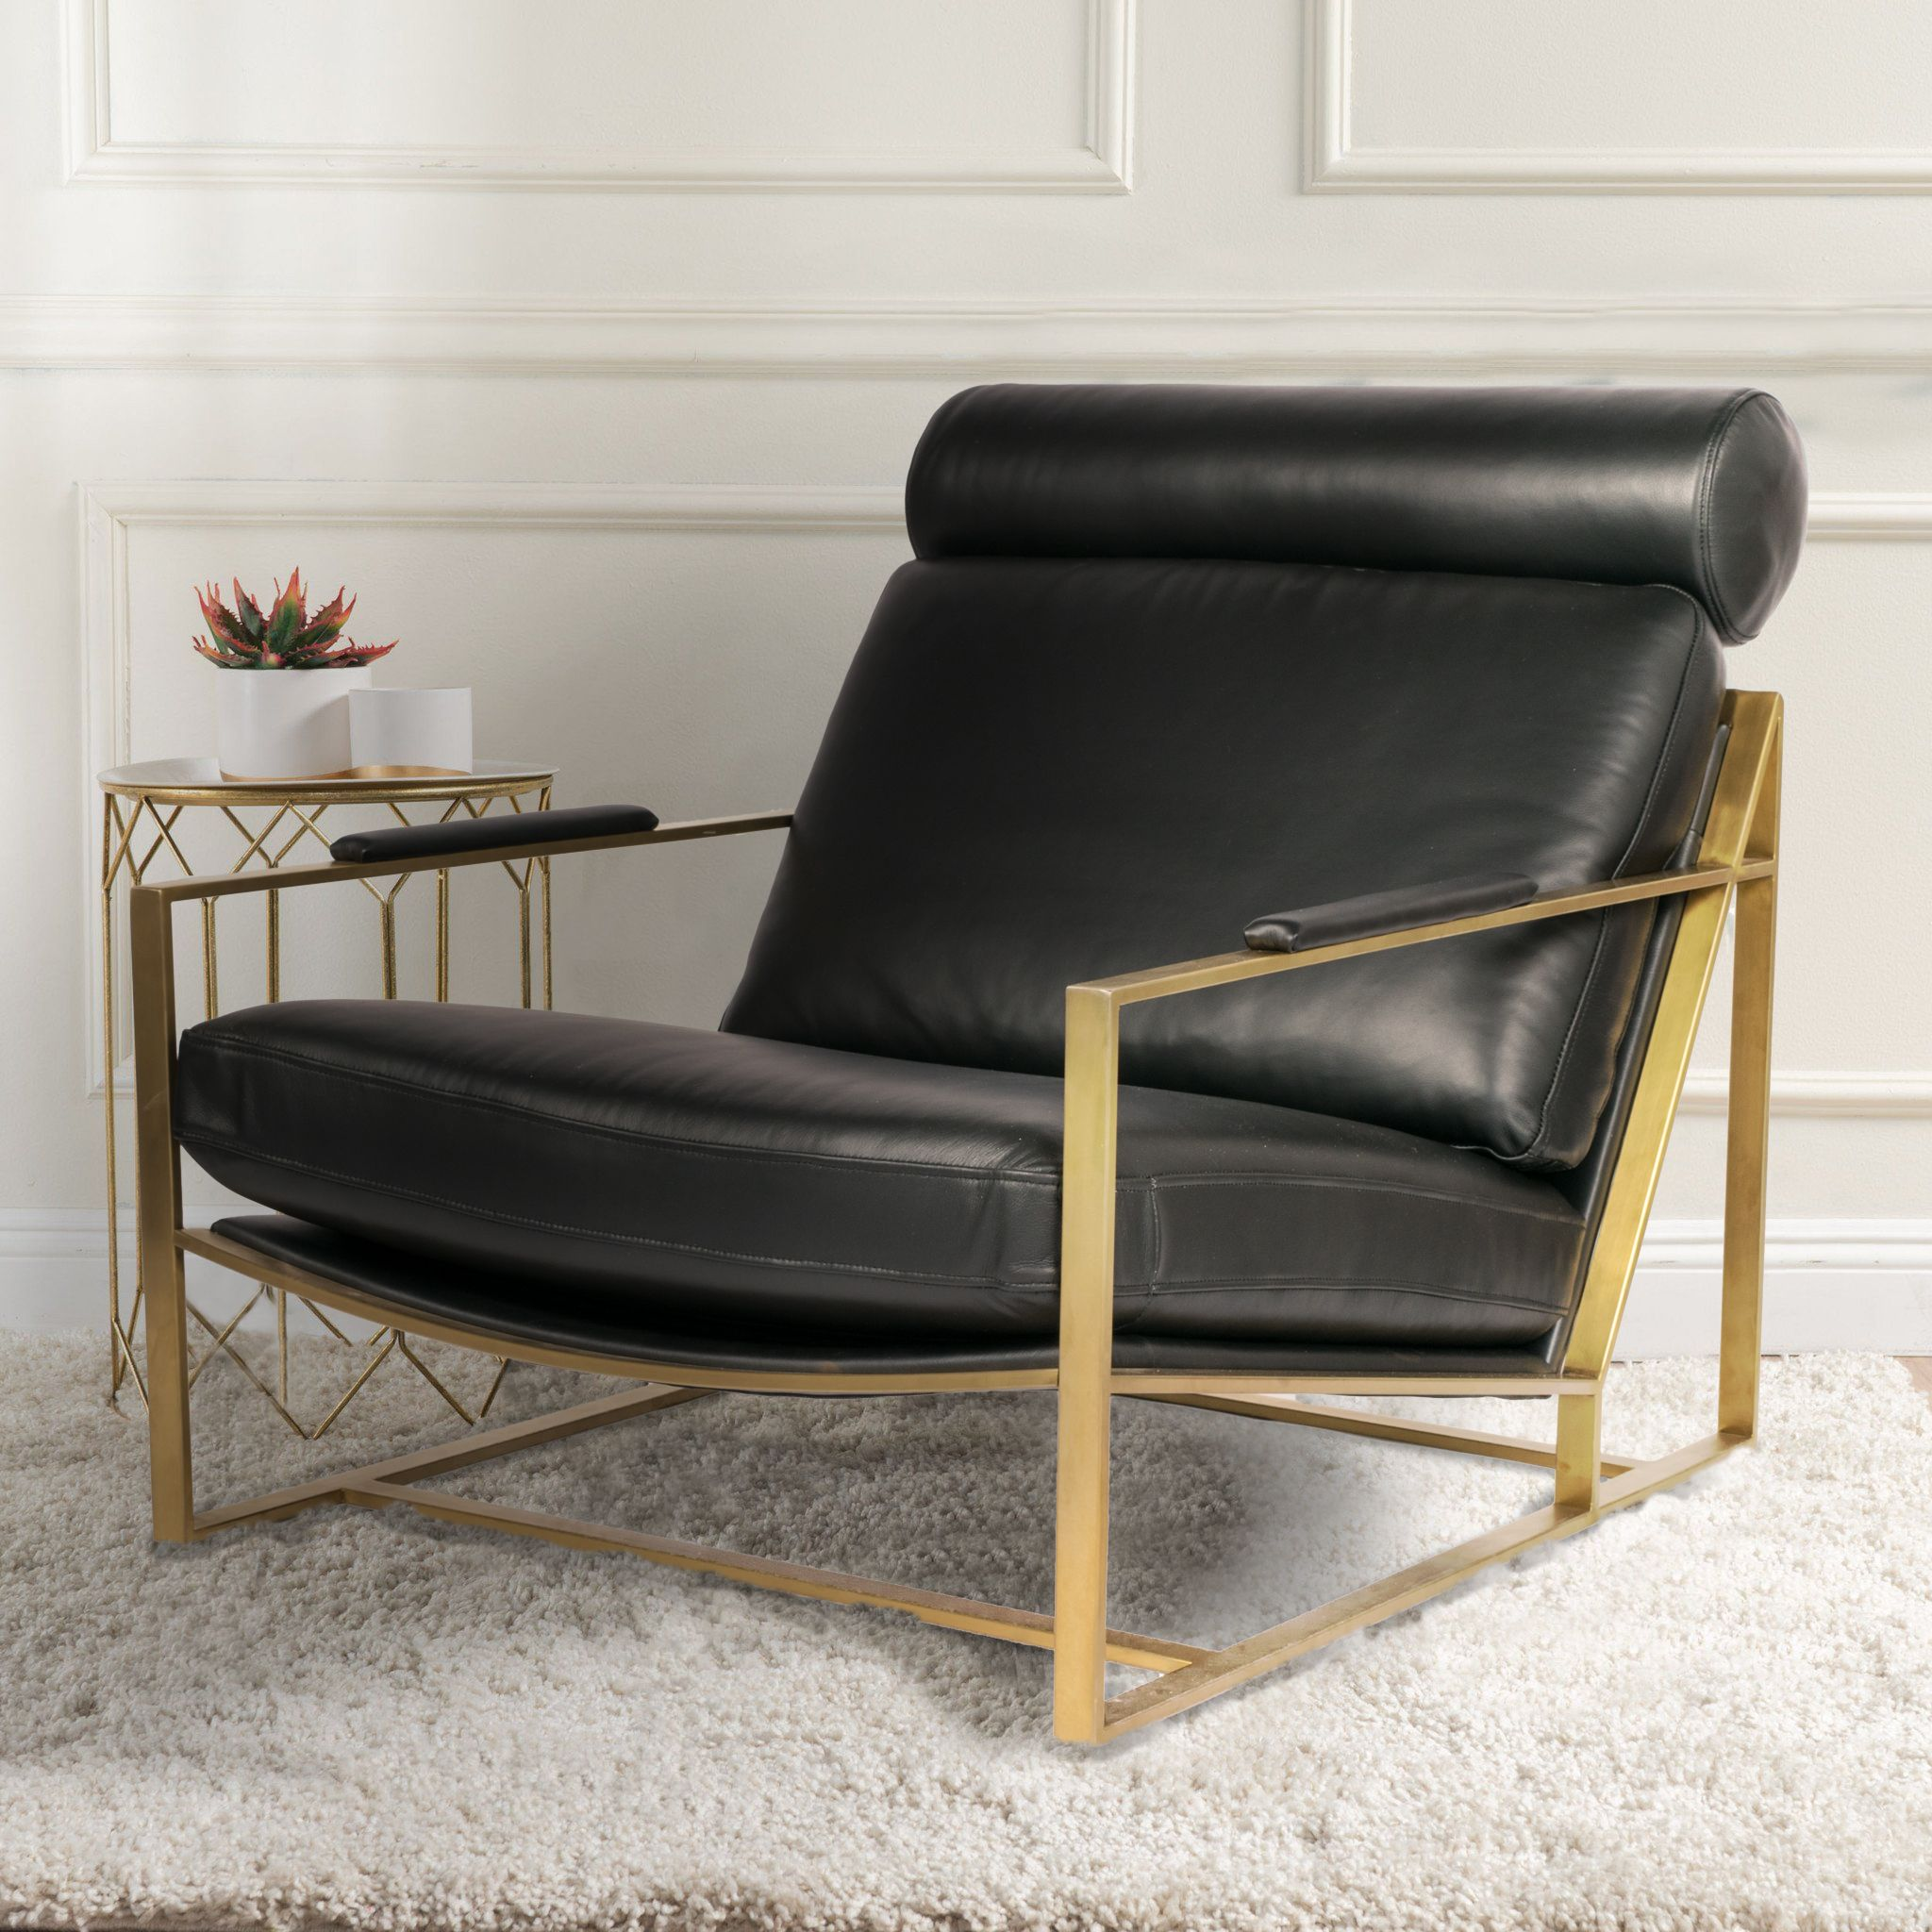 Amazing Americana Lounge Chair In 2019 Chair Lounge Furniture Inzonedesignstudio Interior Chair Design Inzonedesignstudiocom